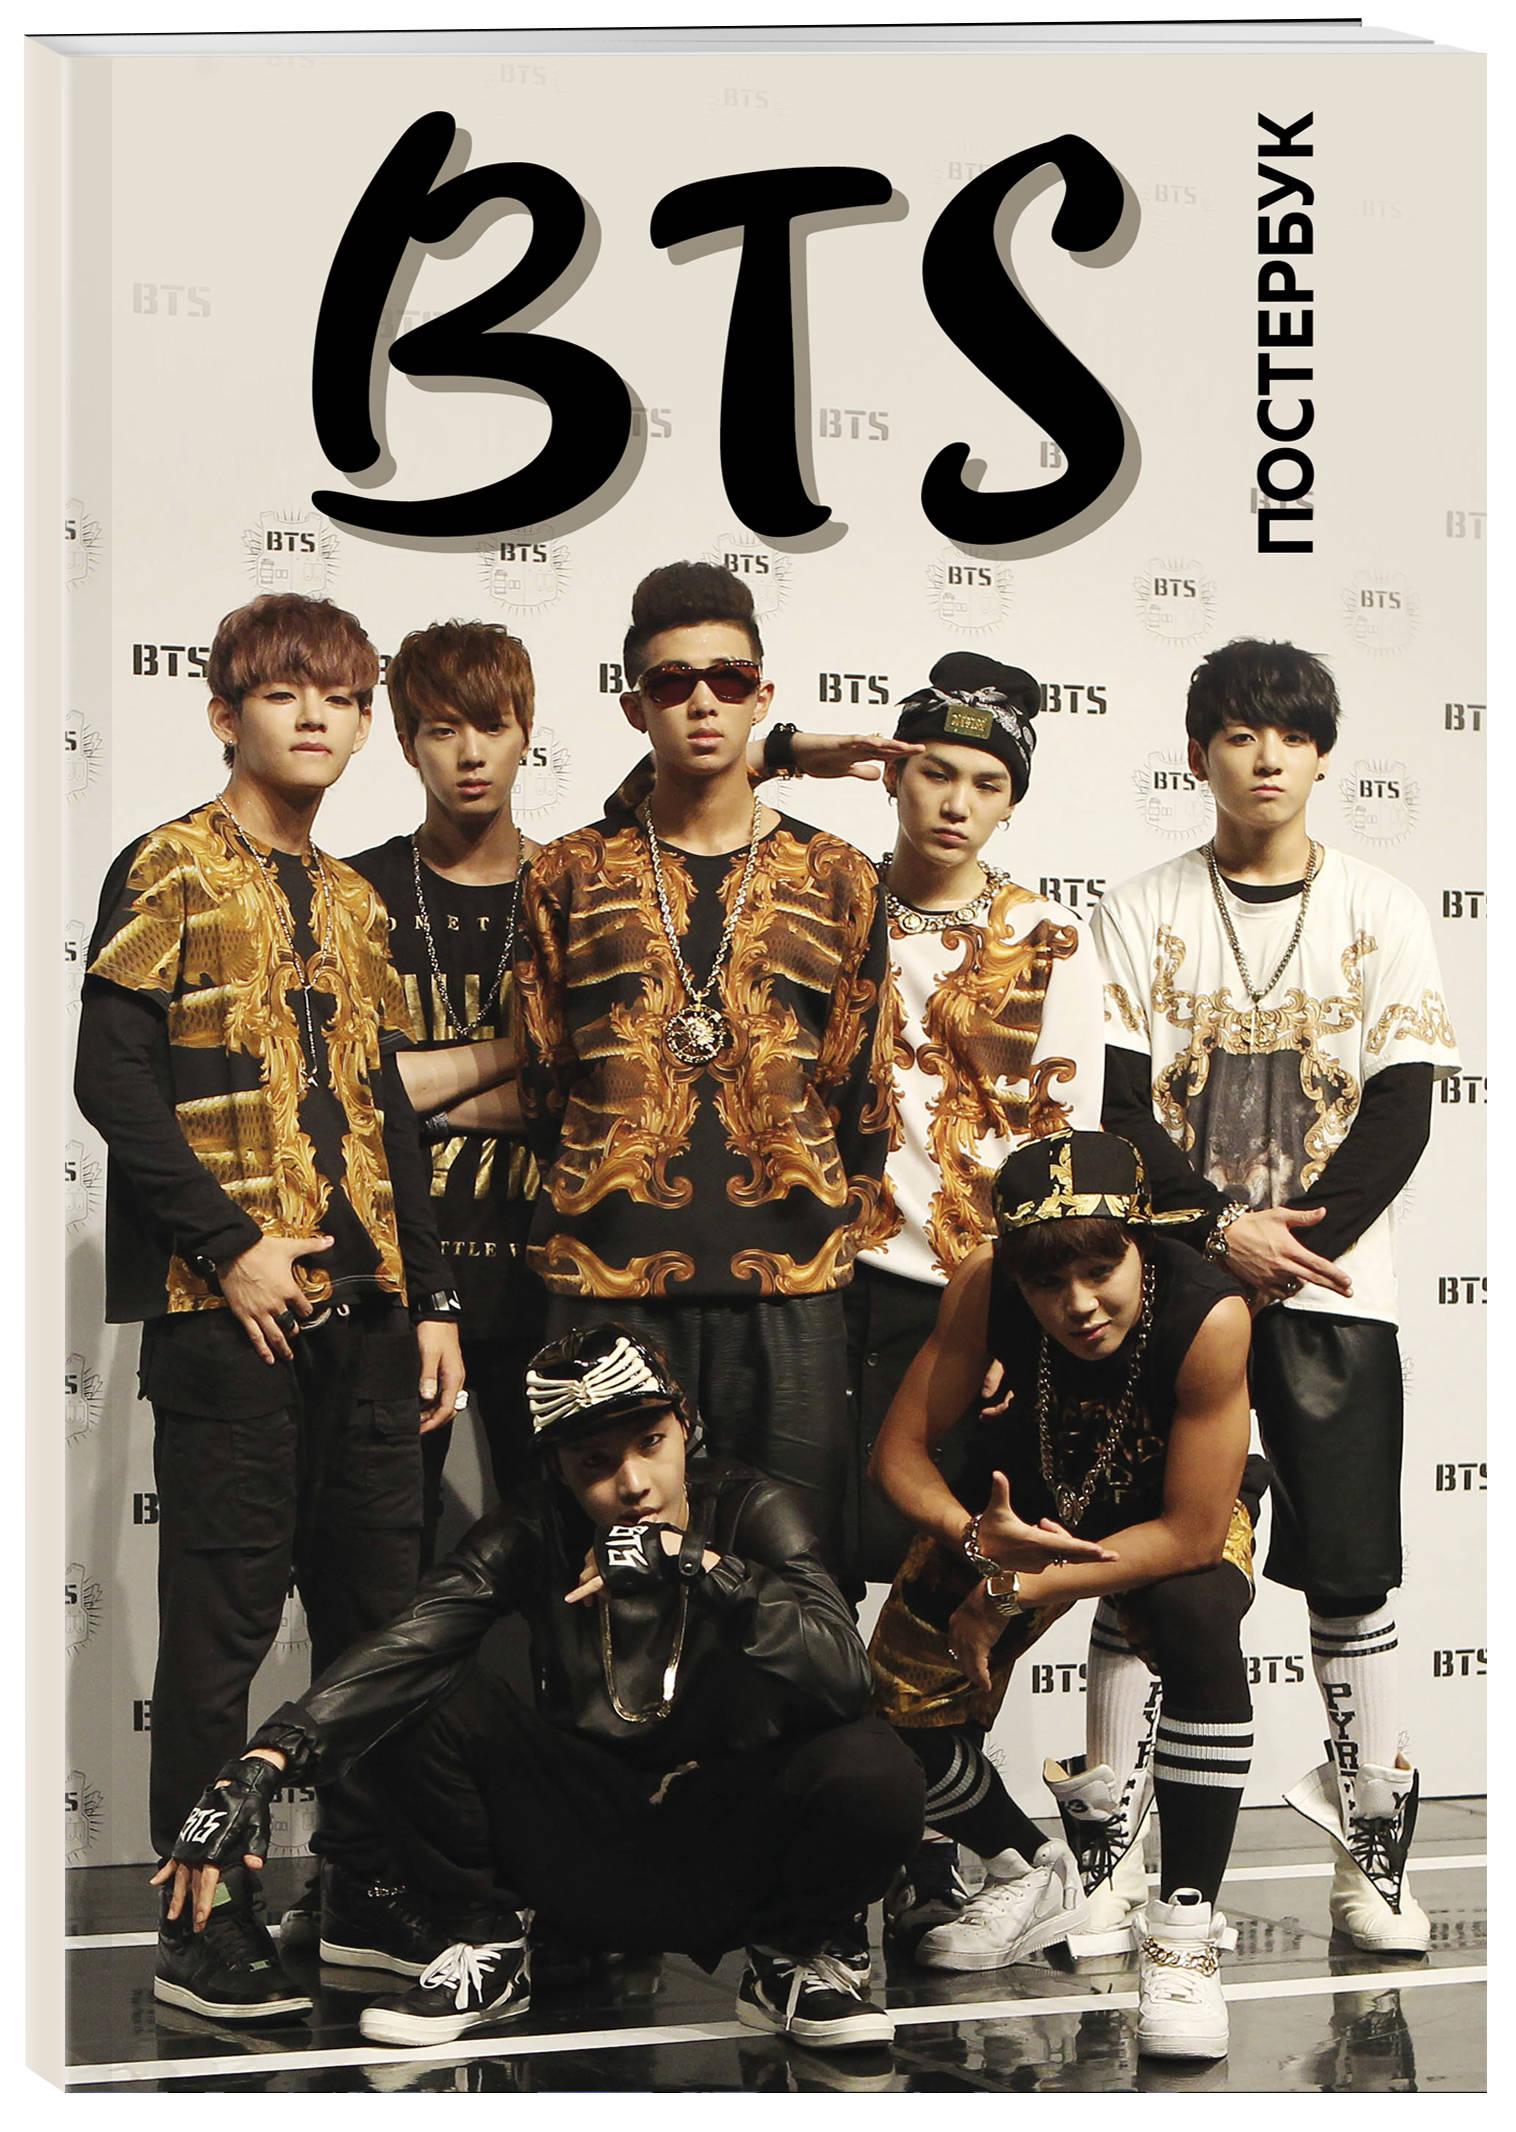 BTS. Постер-бук (9 шт.)